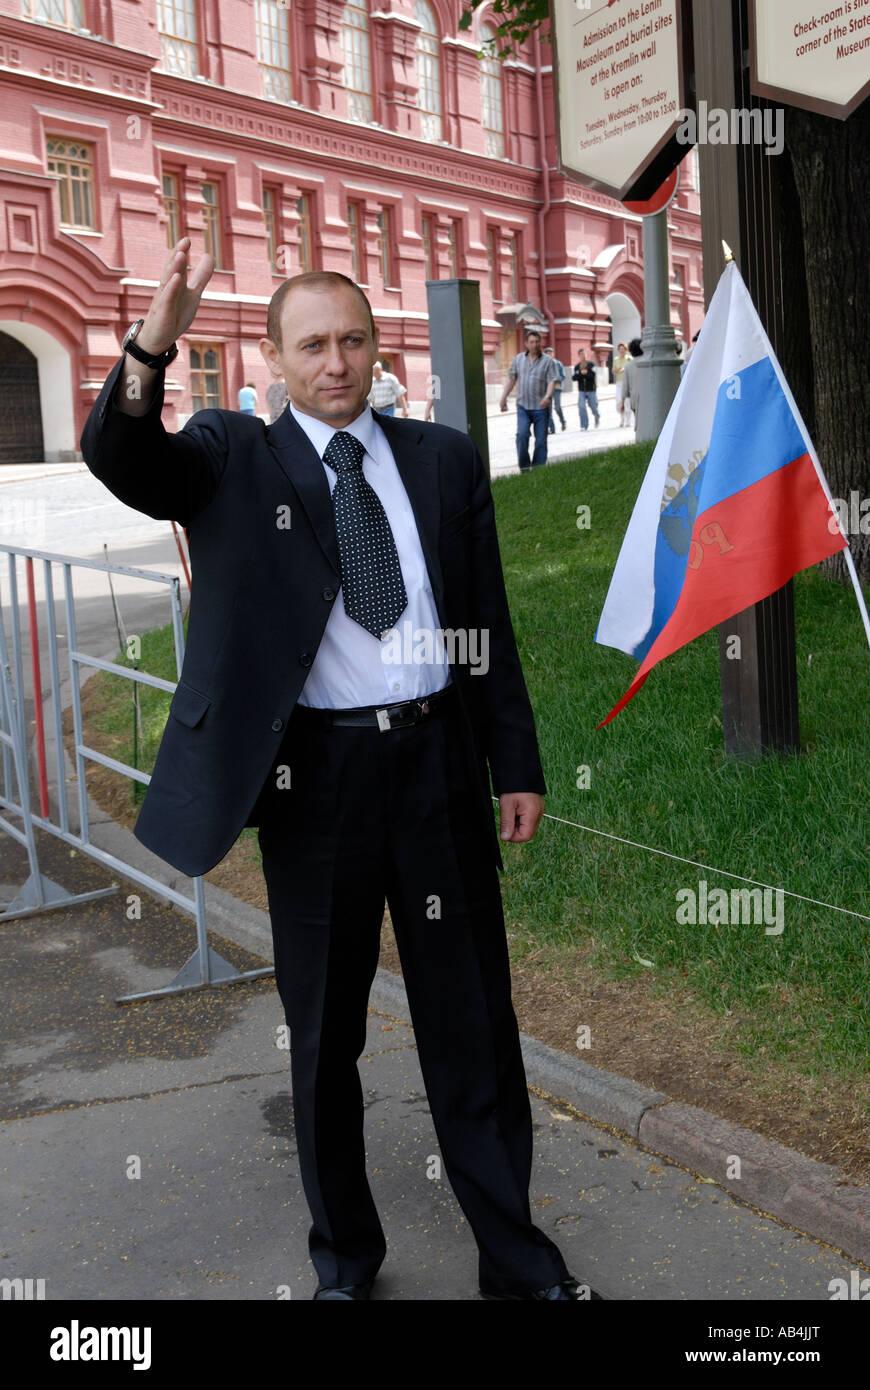 Vladimir Putin lookalike in Moscow - Stock Image